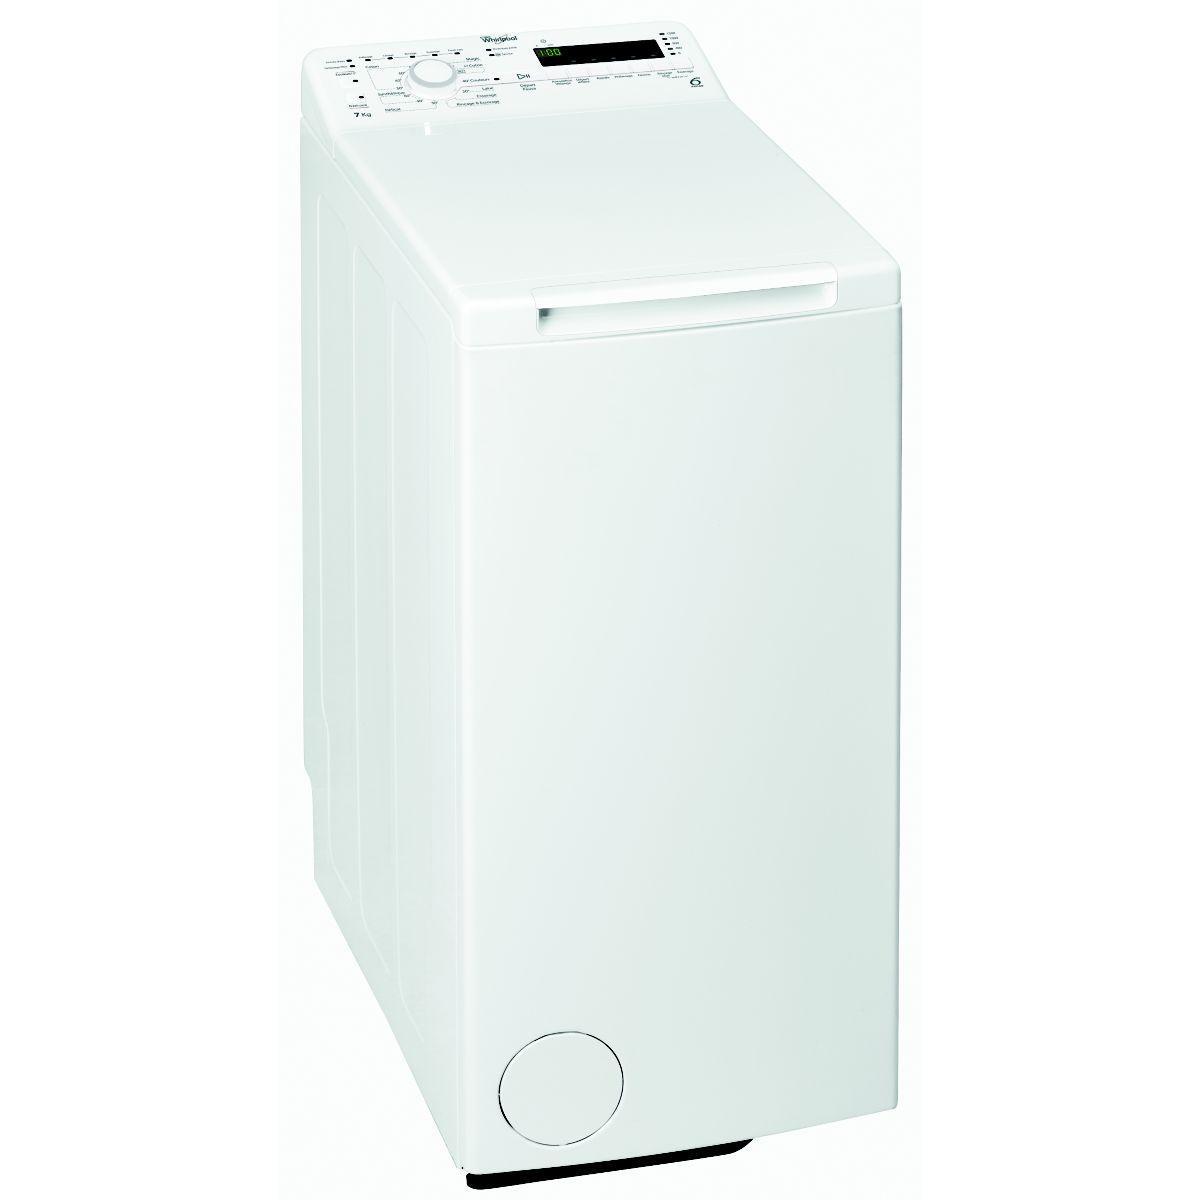 Lave linge top WHIRLPOOL TDLR 70210